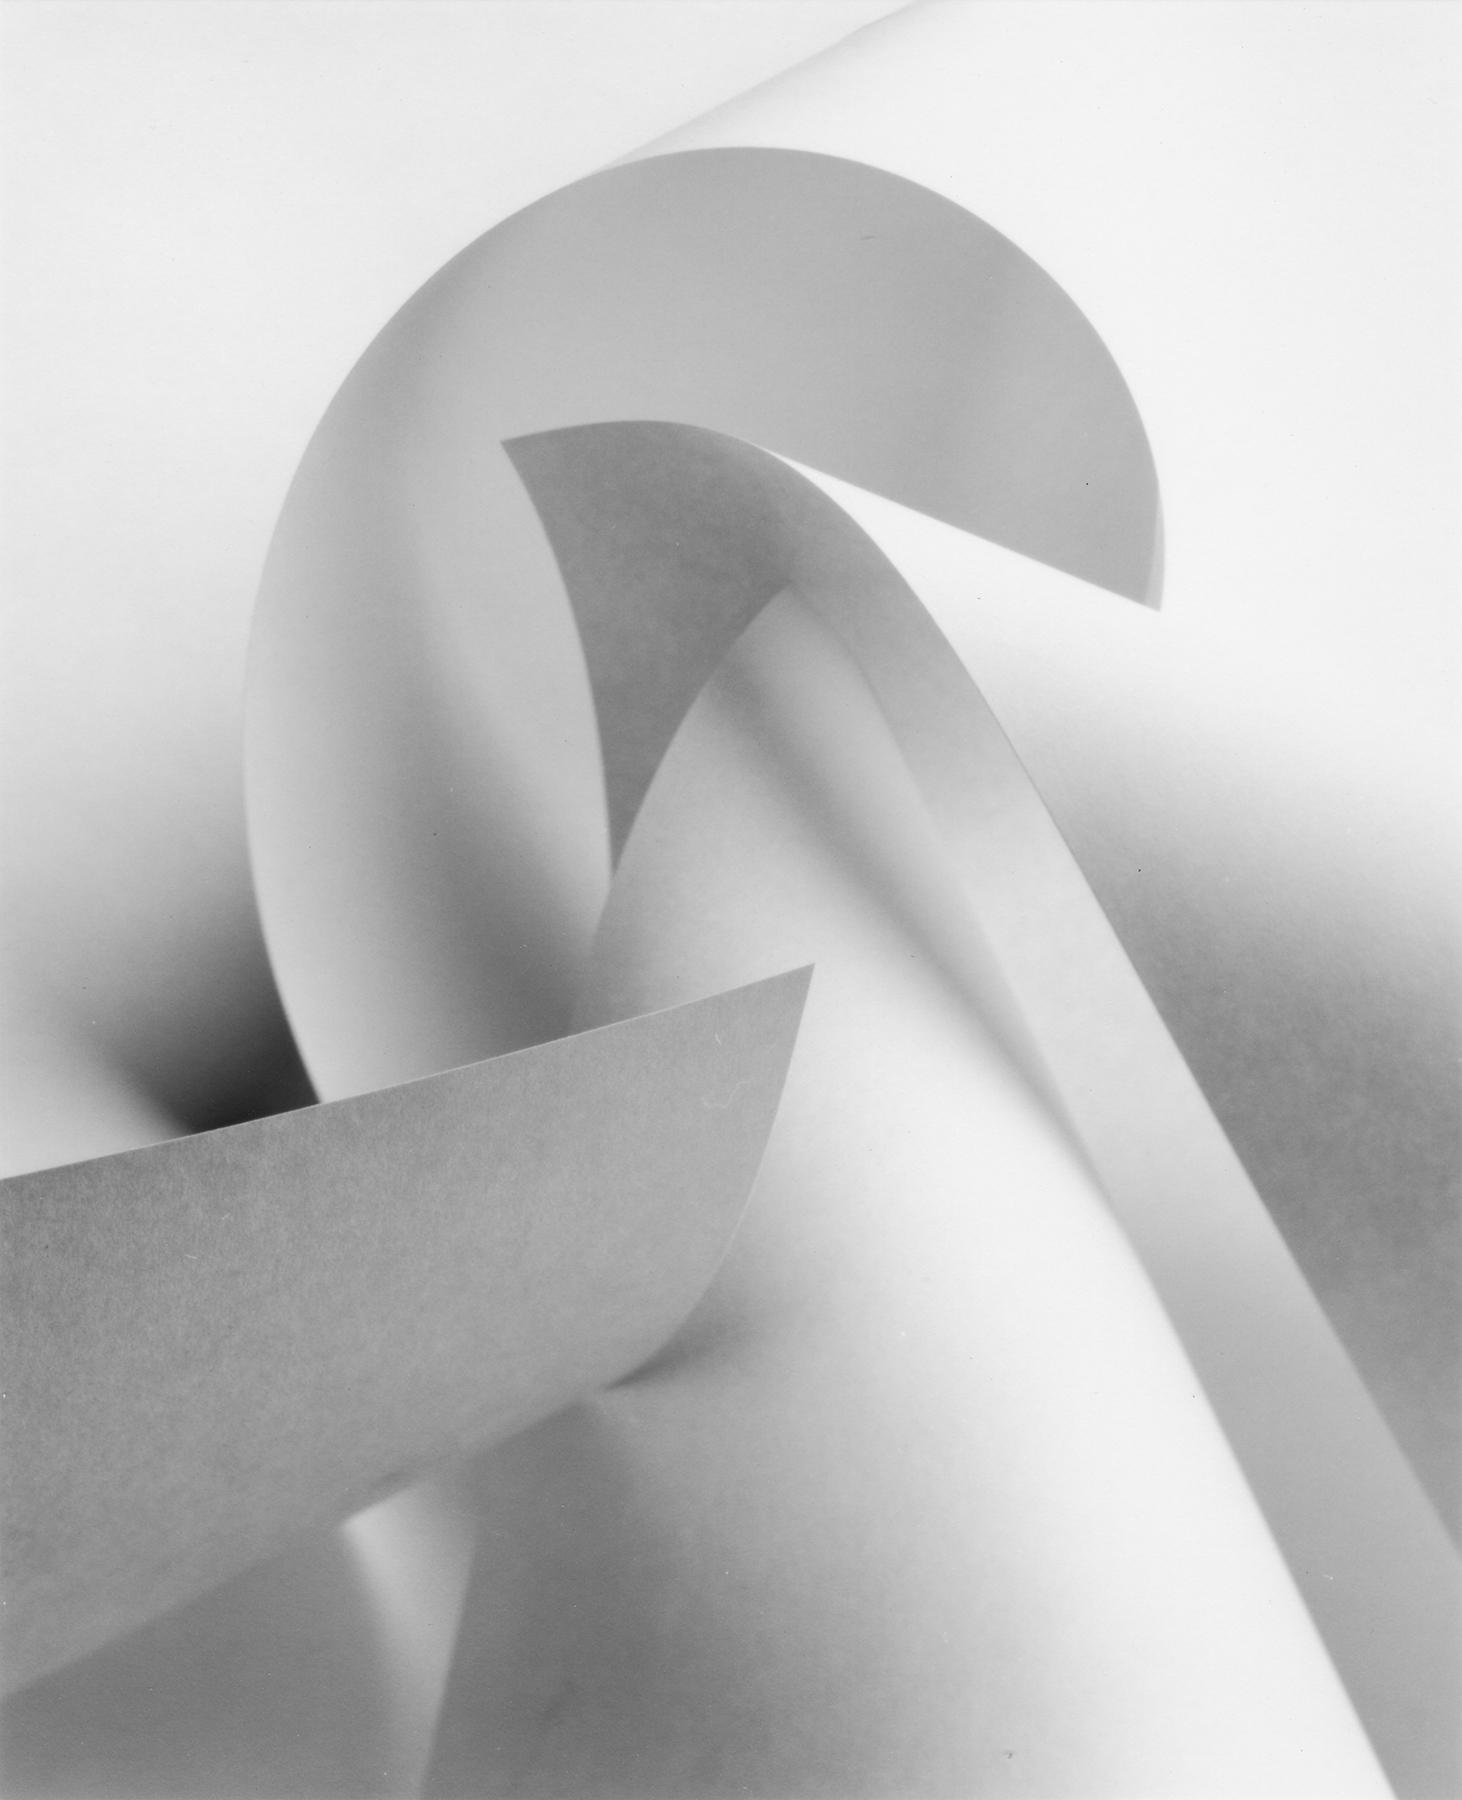 51_Anne_Larsen_Paper_Form_1.jpg